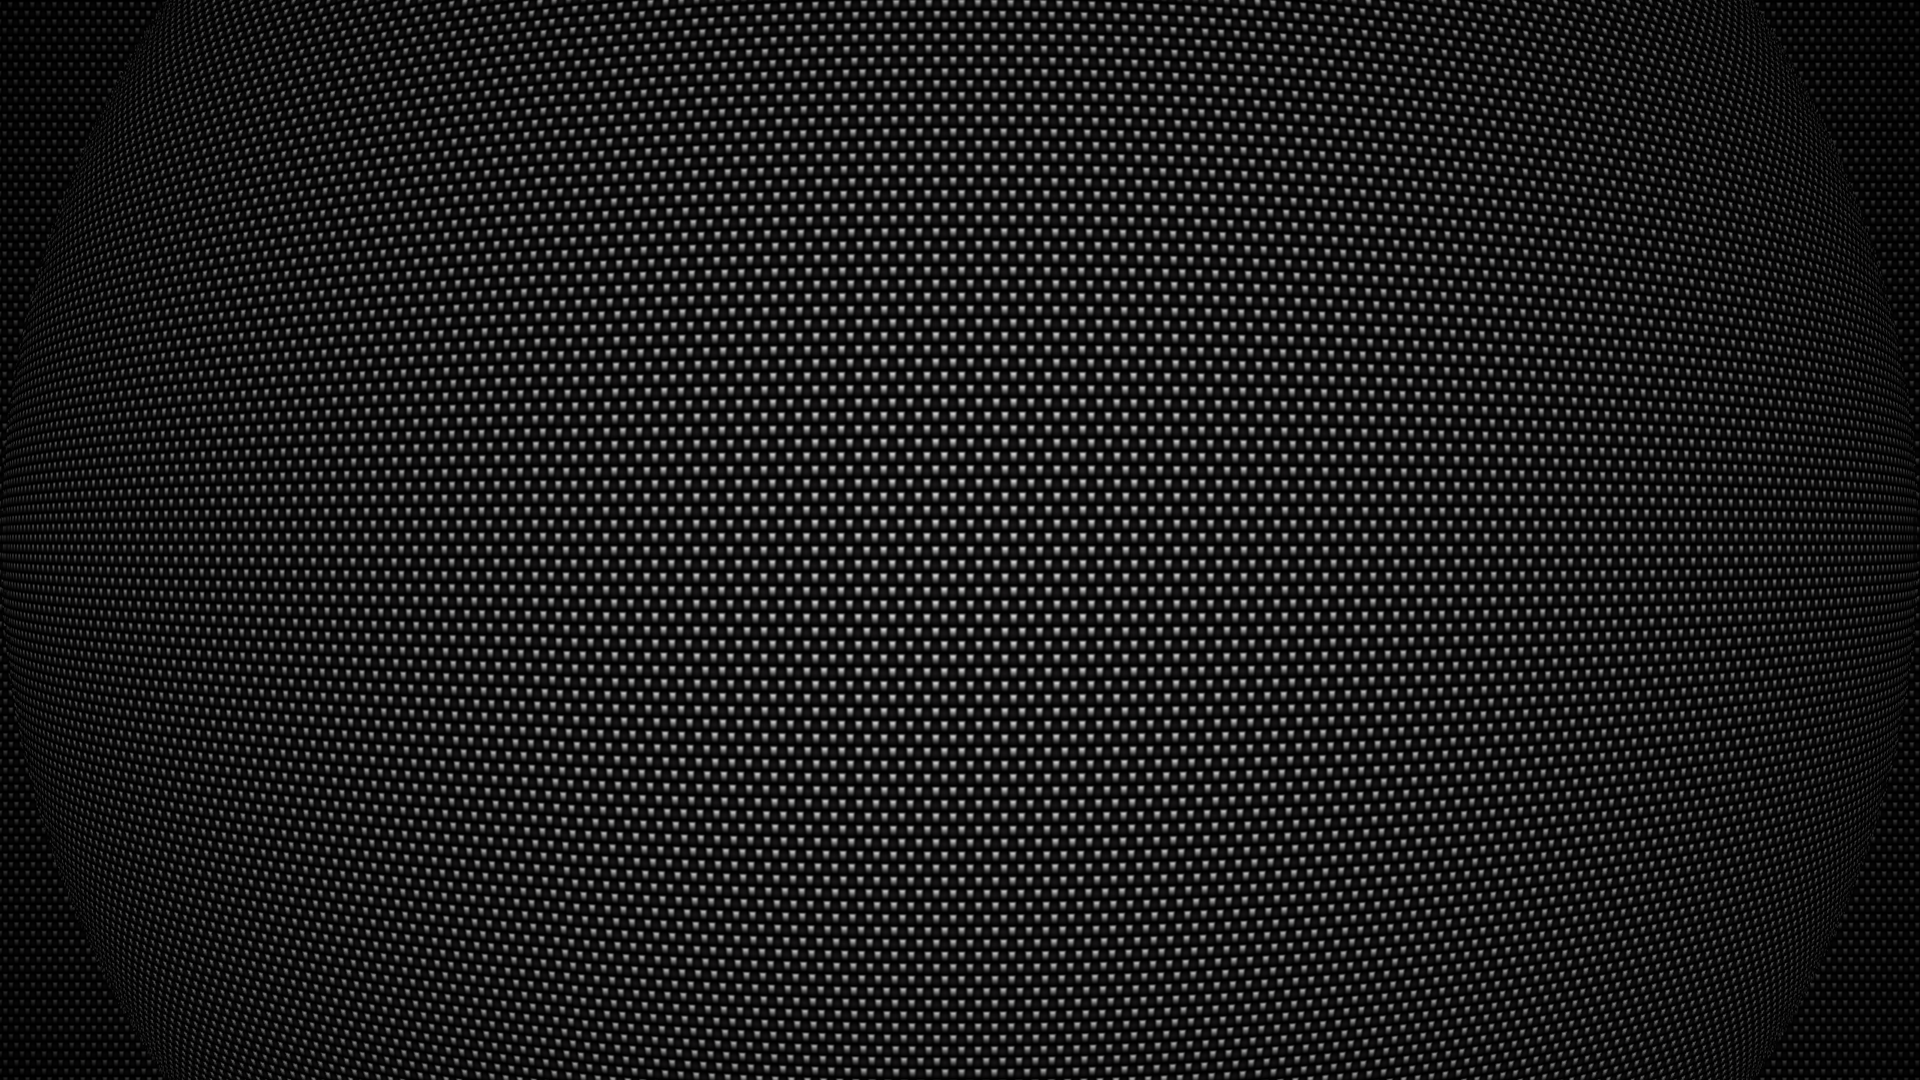 Metallic texture Wallpaper 3390 1920x1080